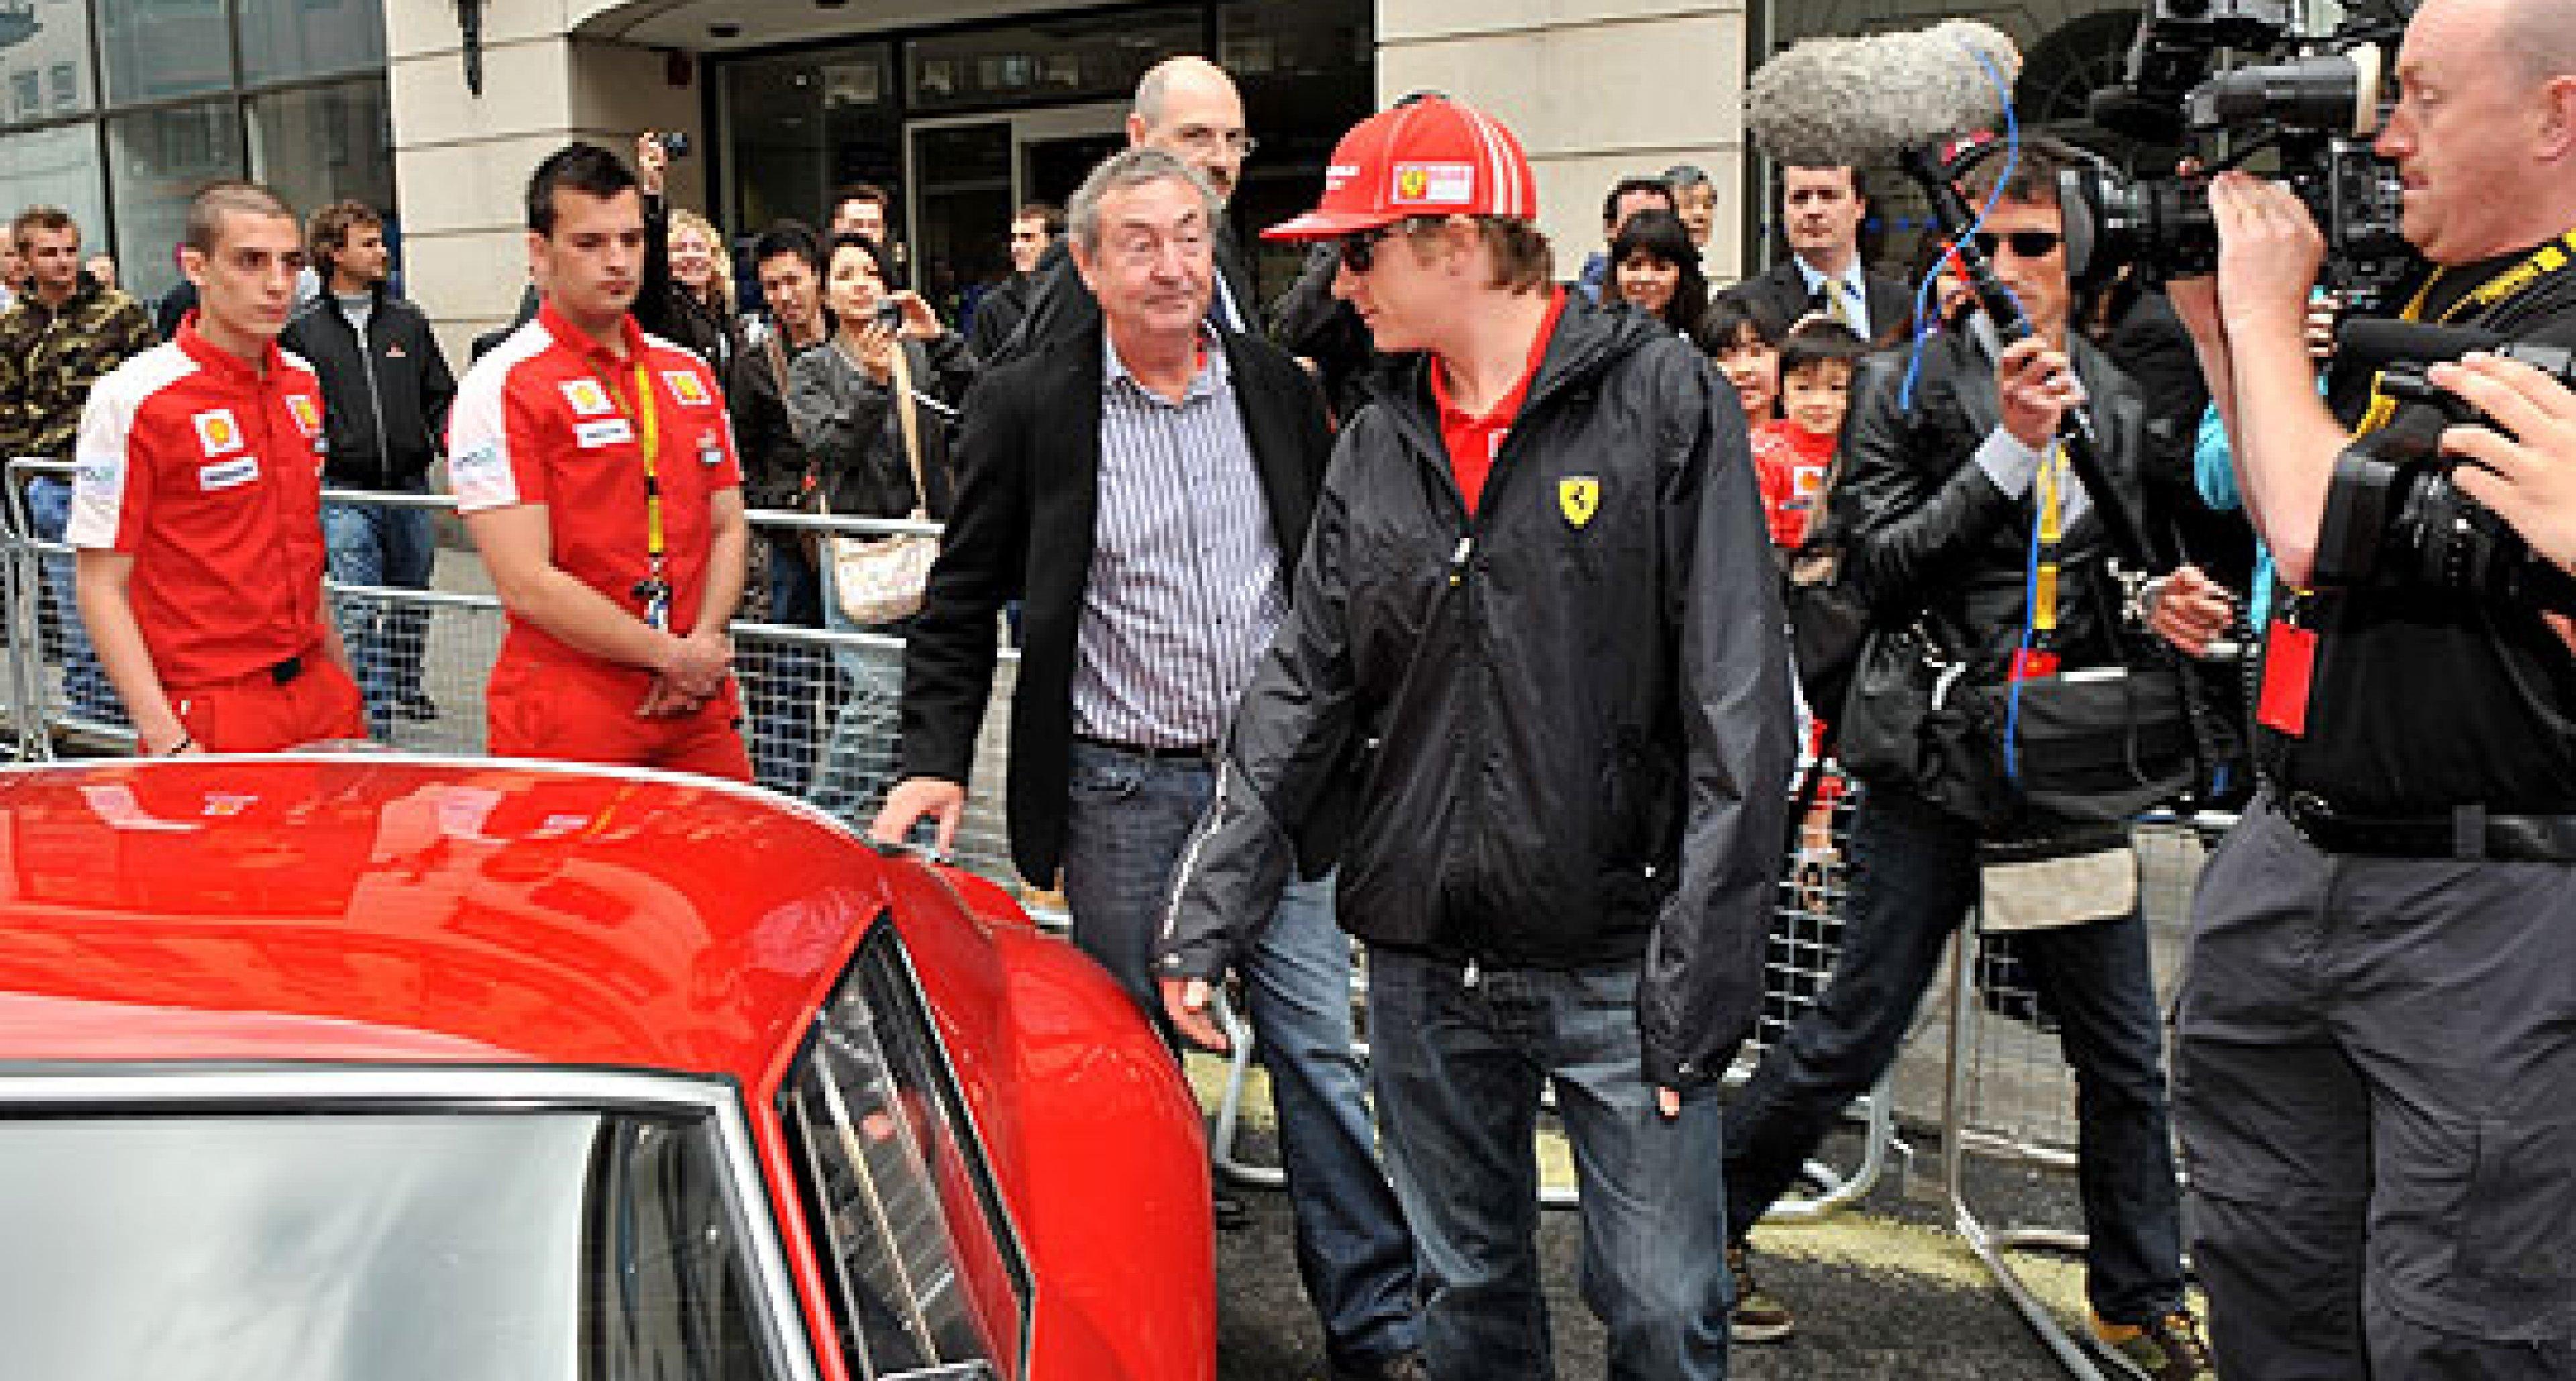 Ferrari Store Opens in London